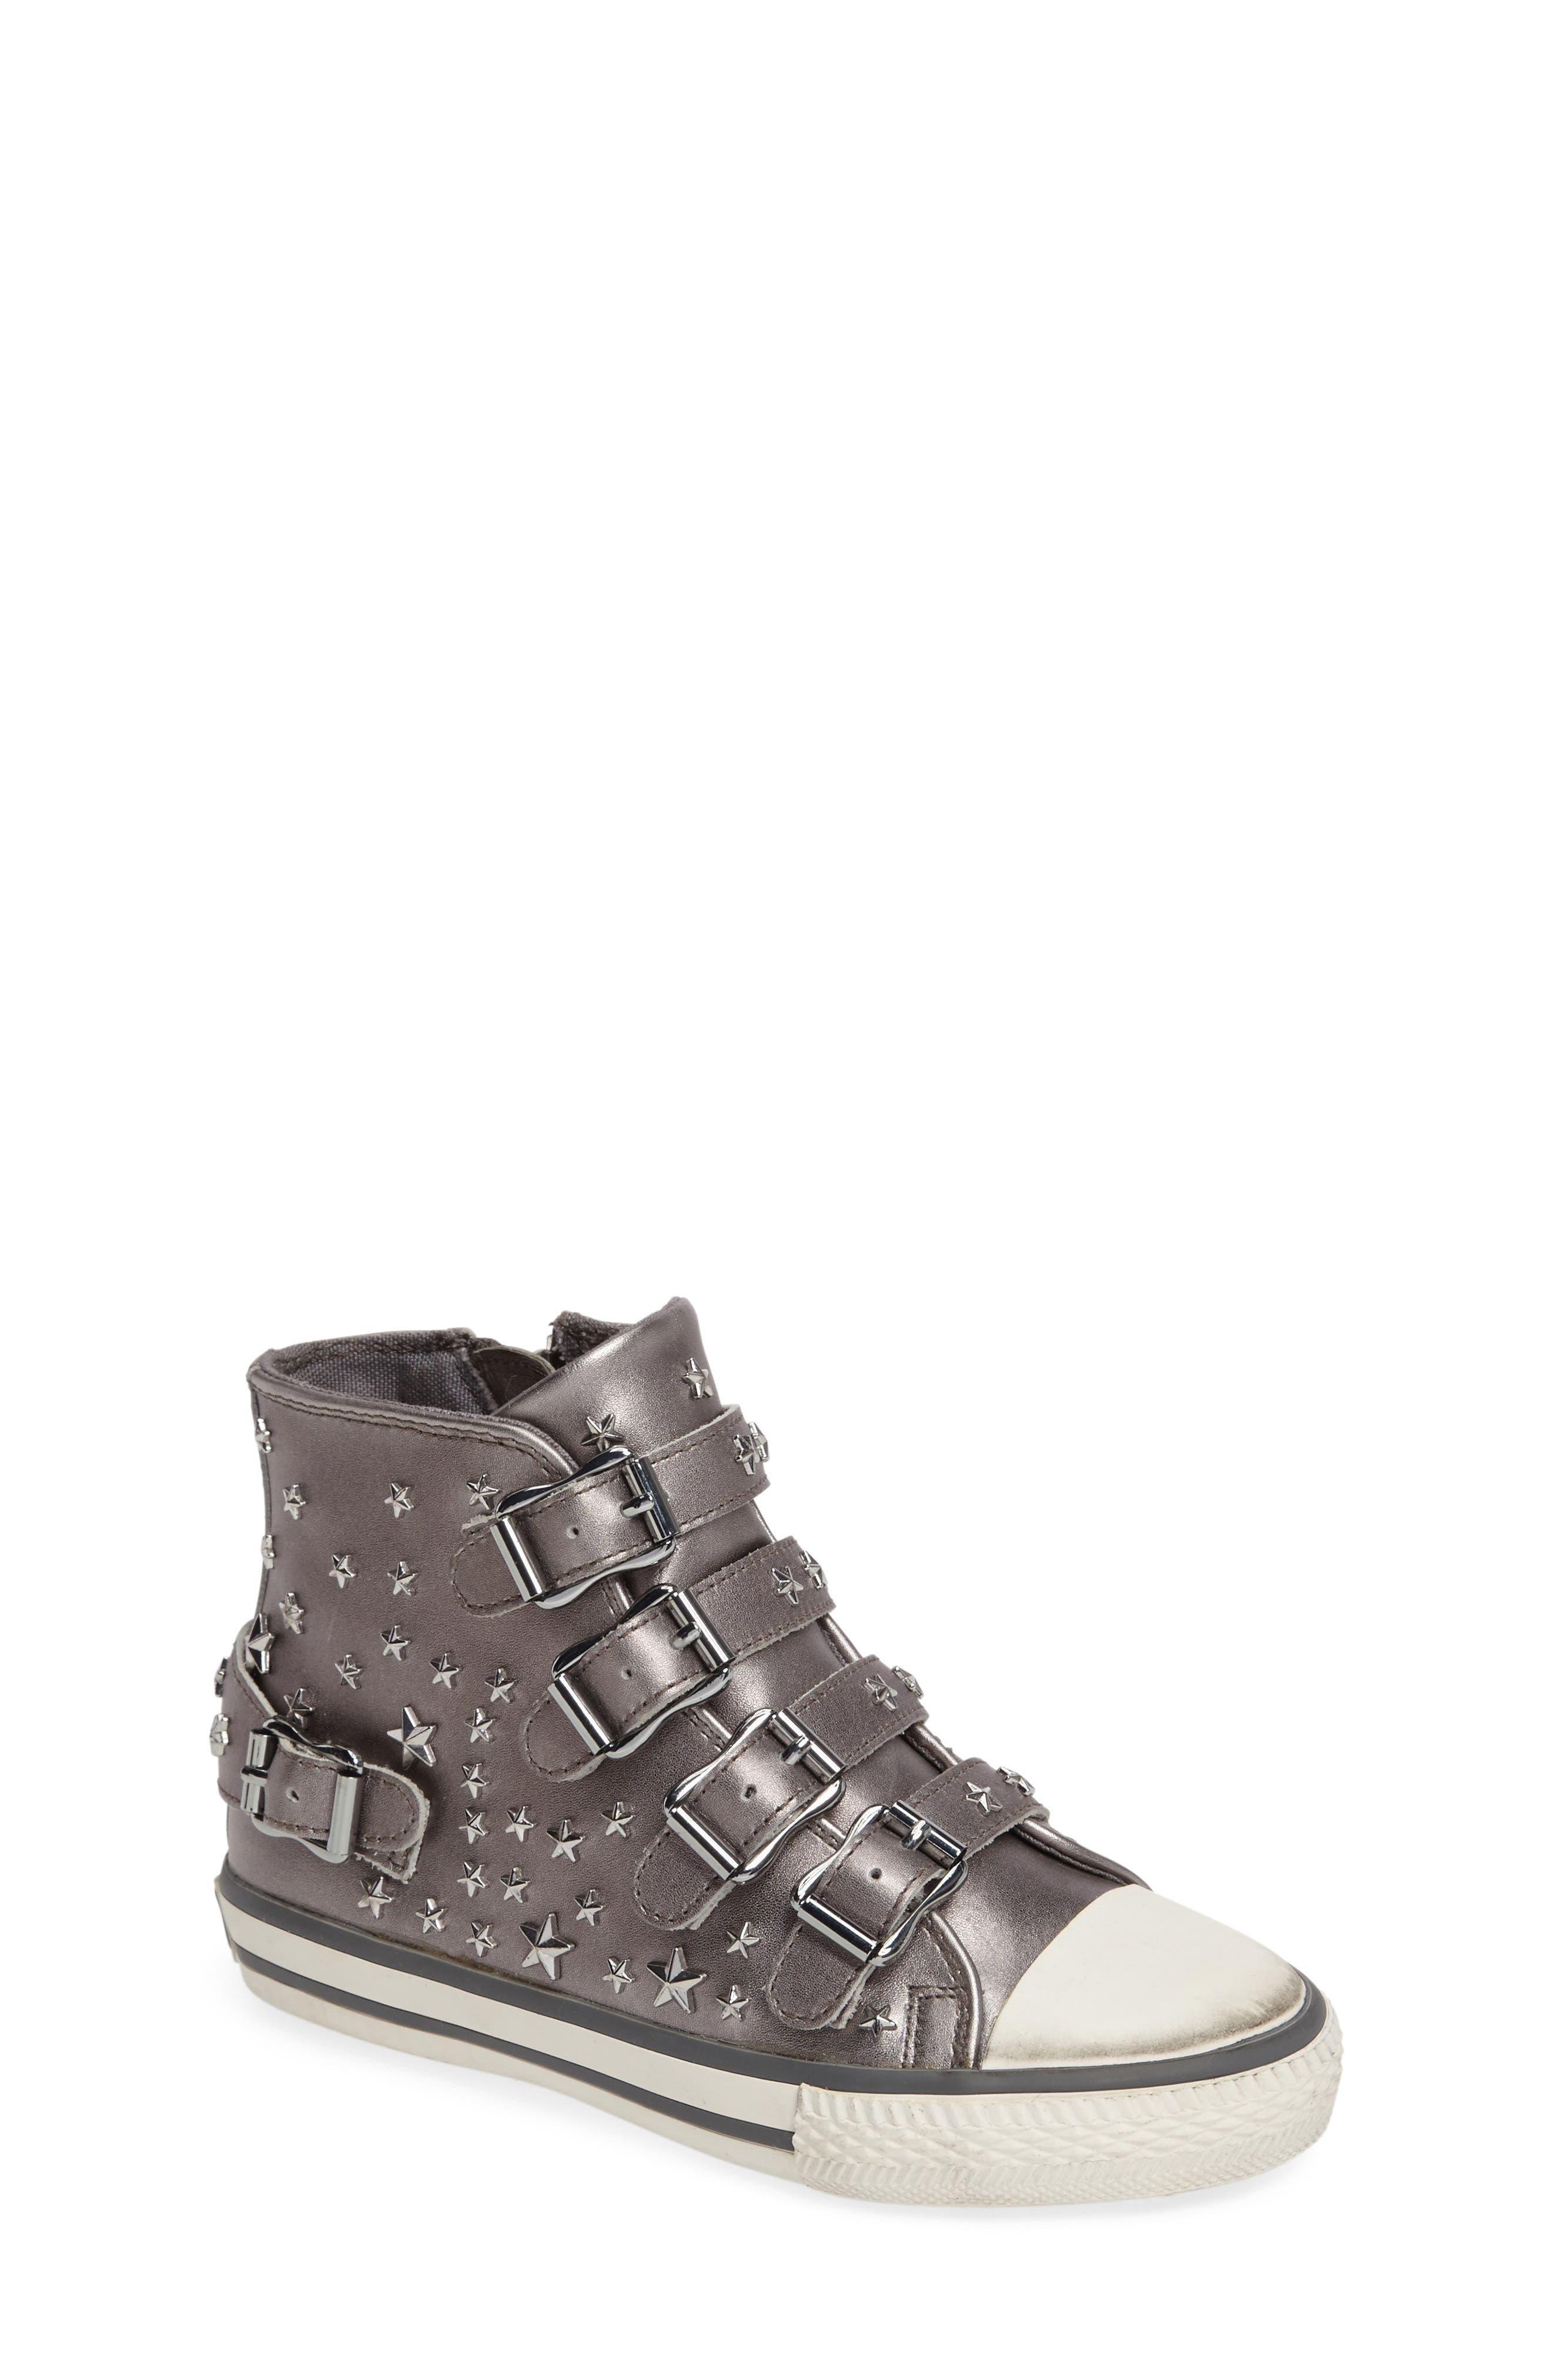 Vava Star Stud Sneaker,                         Main,                         color, 081